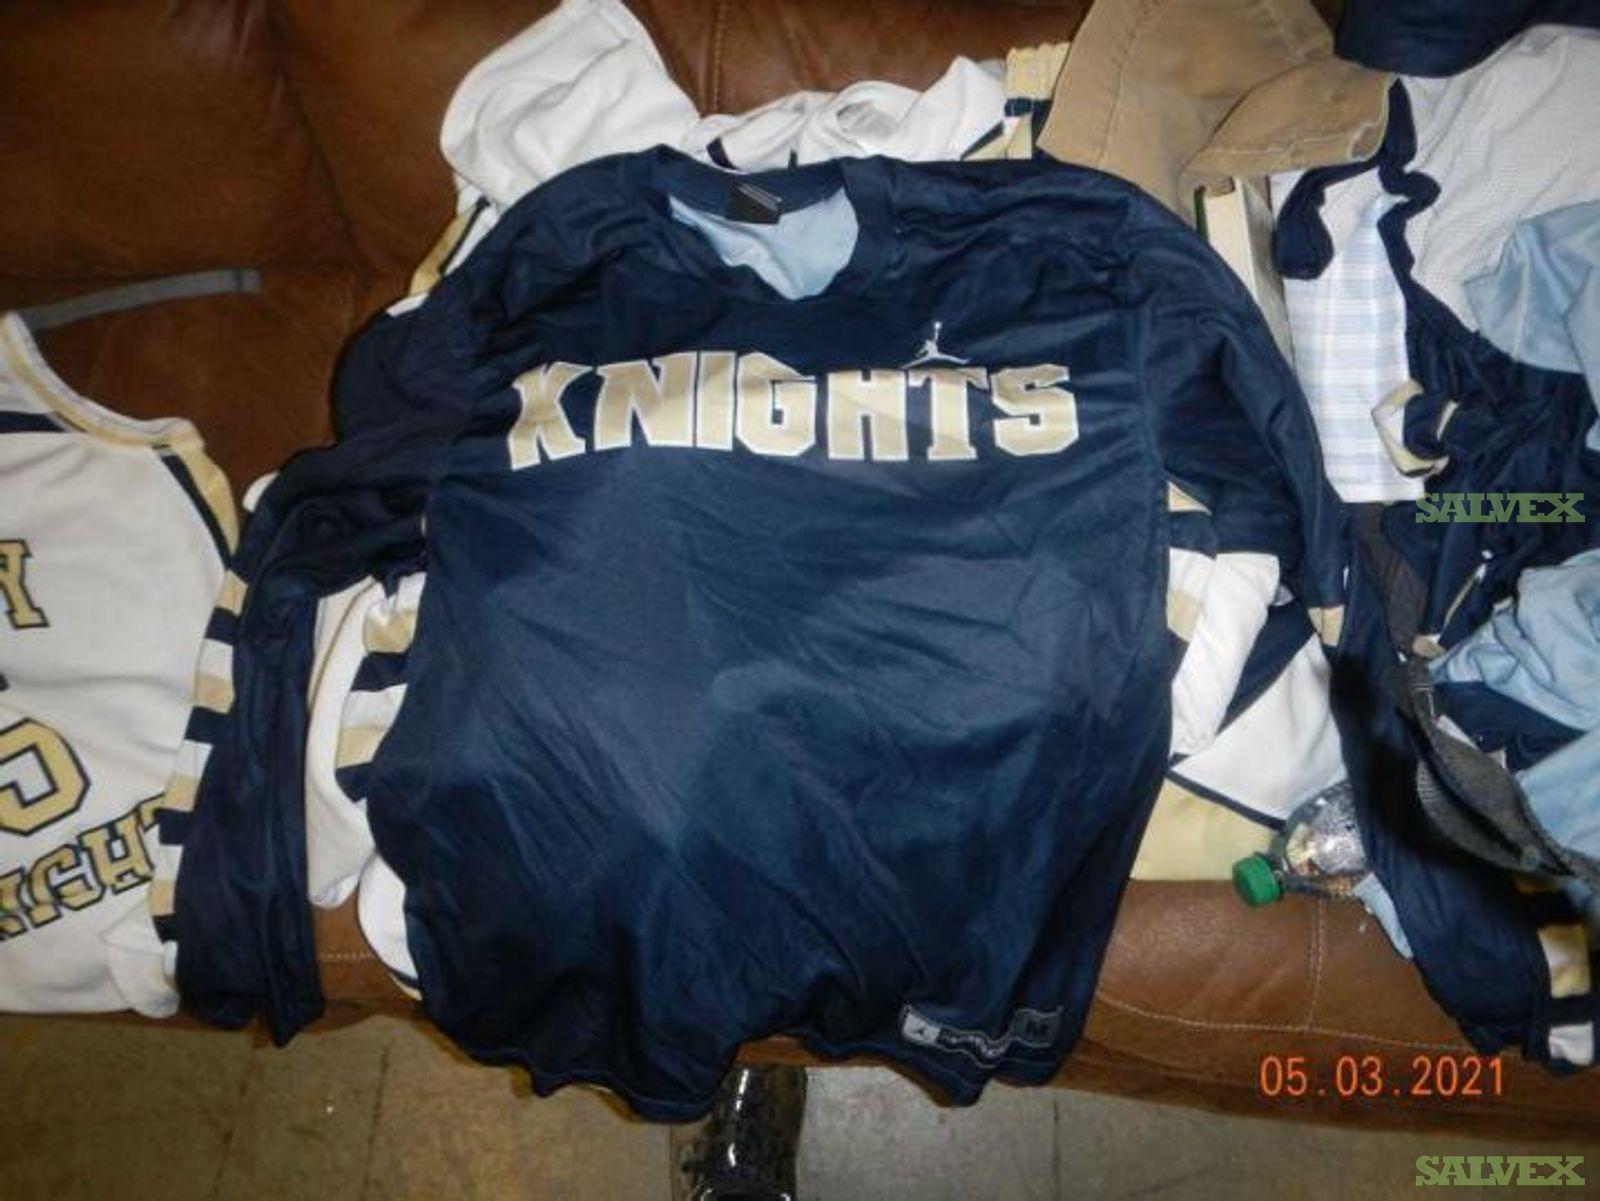 Sports Apparel: Jordan Gray Uniform, Nike Digital Hyperlite Showcase Jersey, Nike Backpack and More